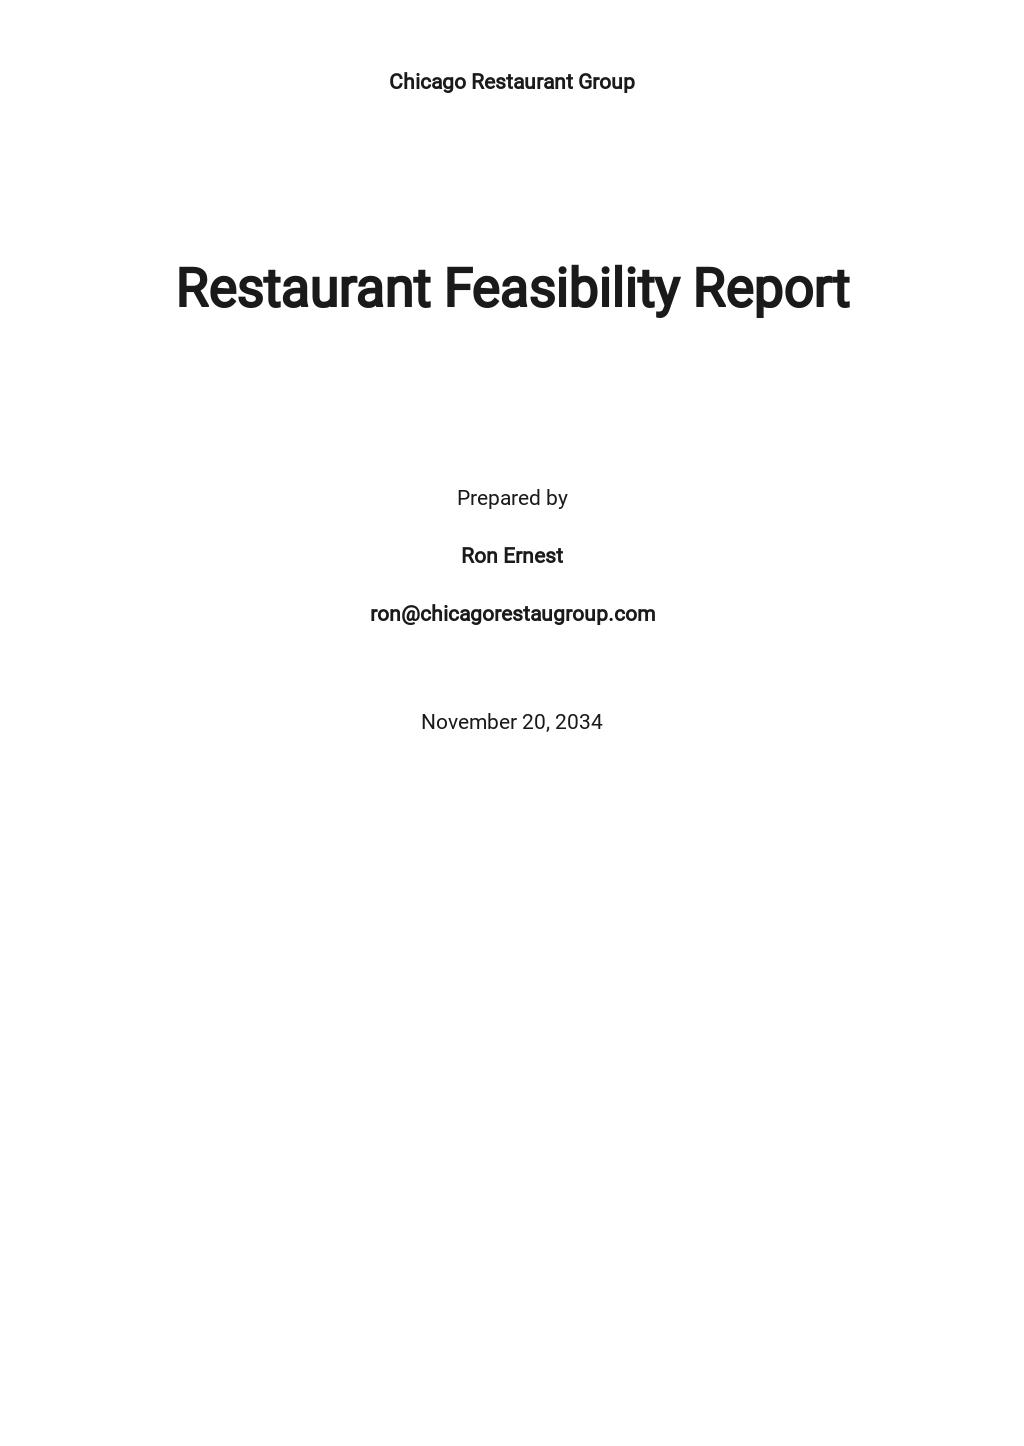 Restaurant Feasibility Report Template.jpe